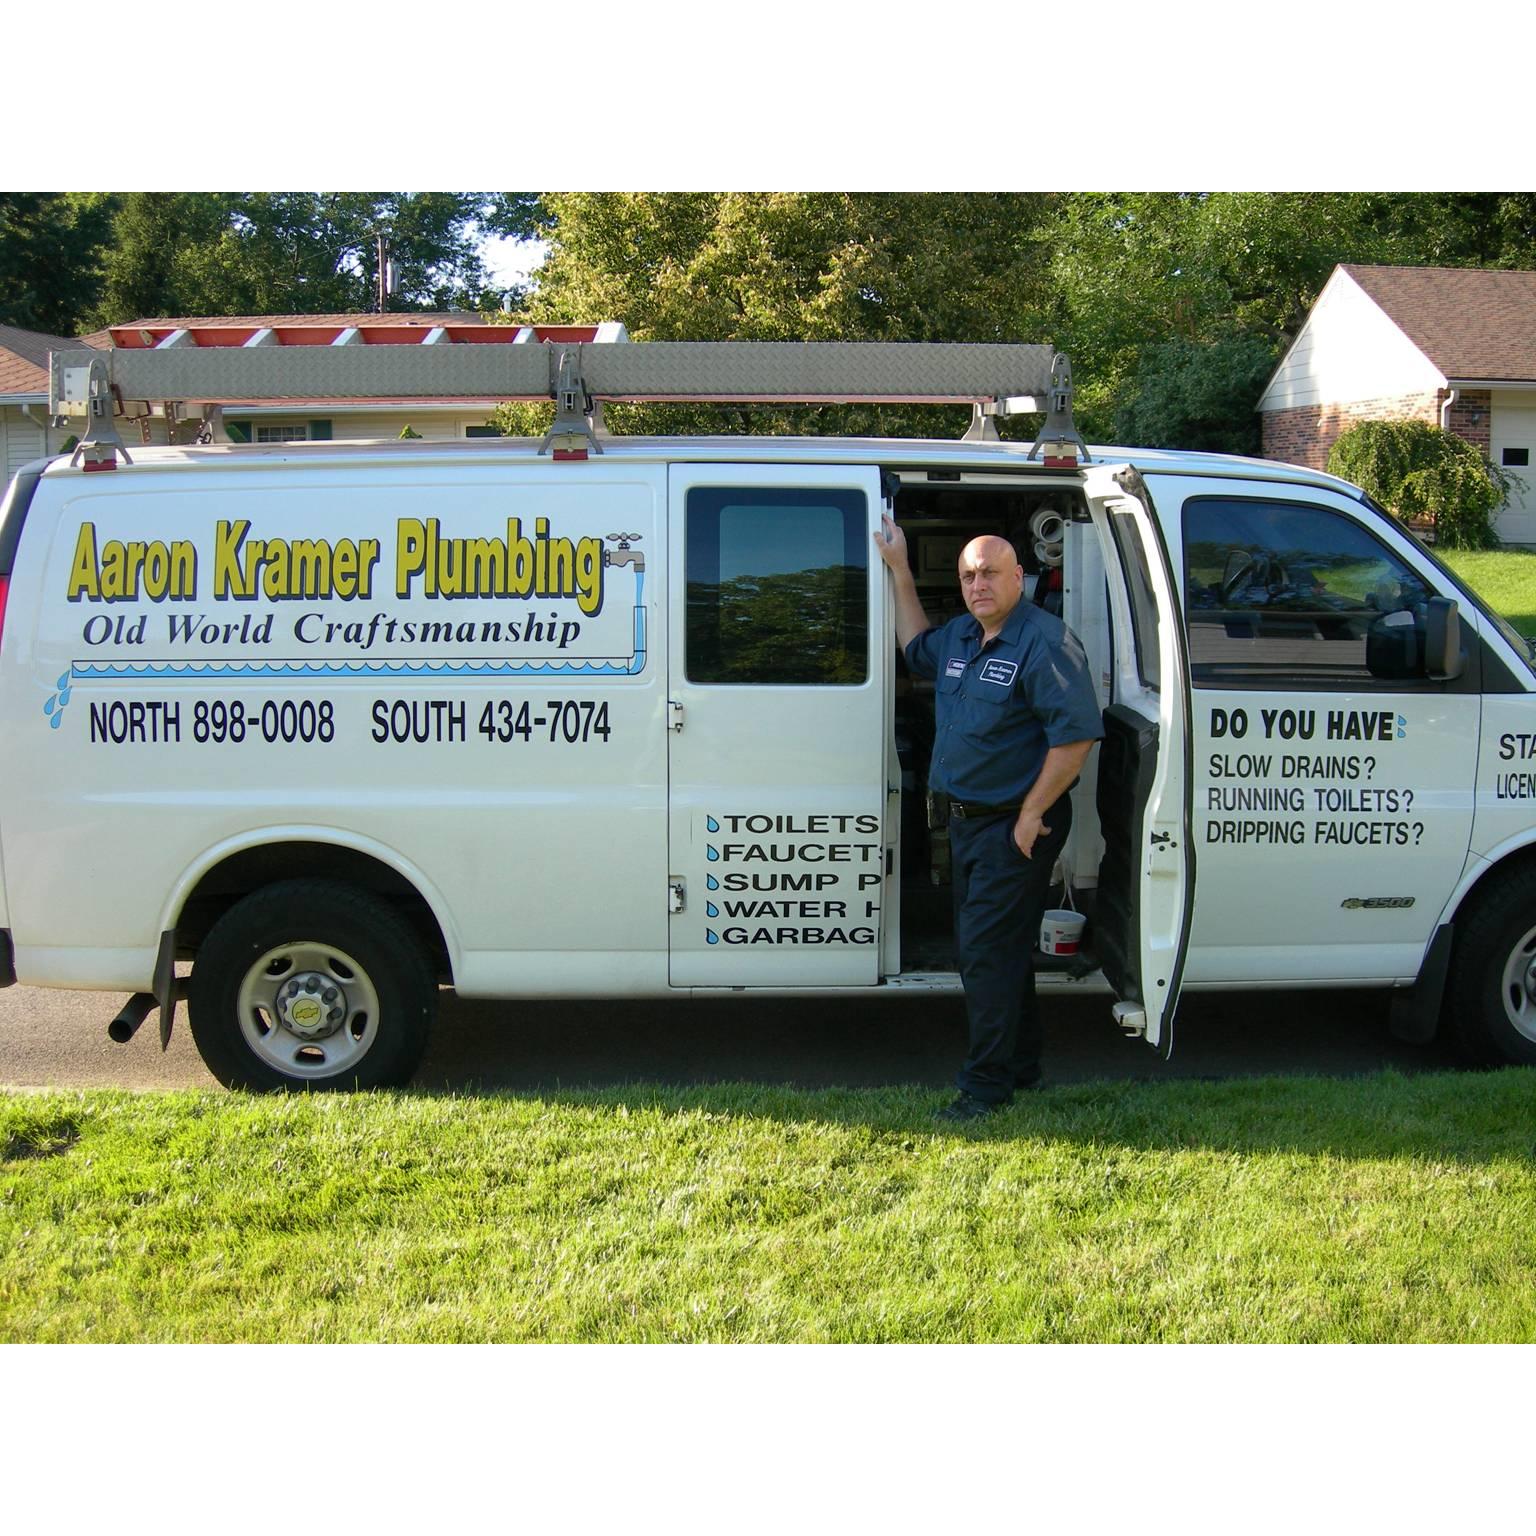 image of the Aaron Kramer Plumbing